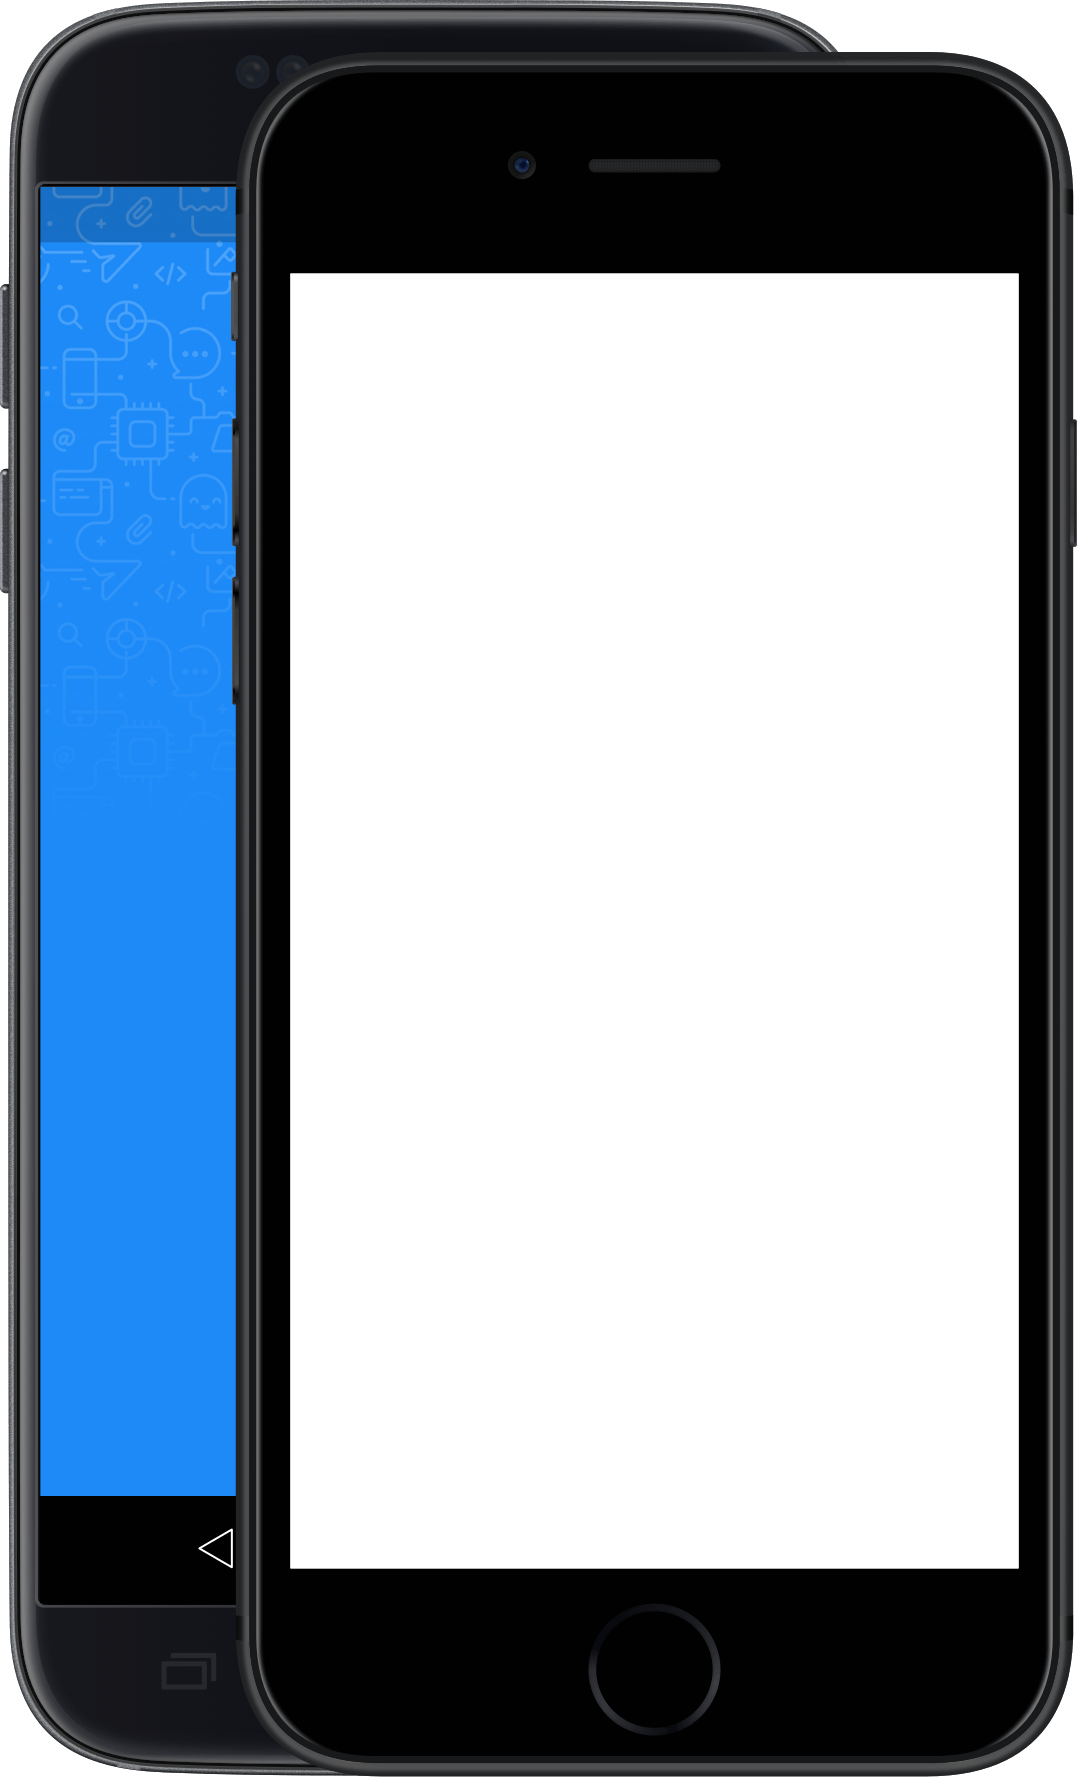 Atlassian Mobile para iOS y Android